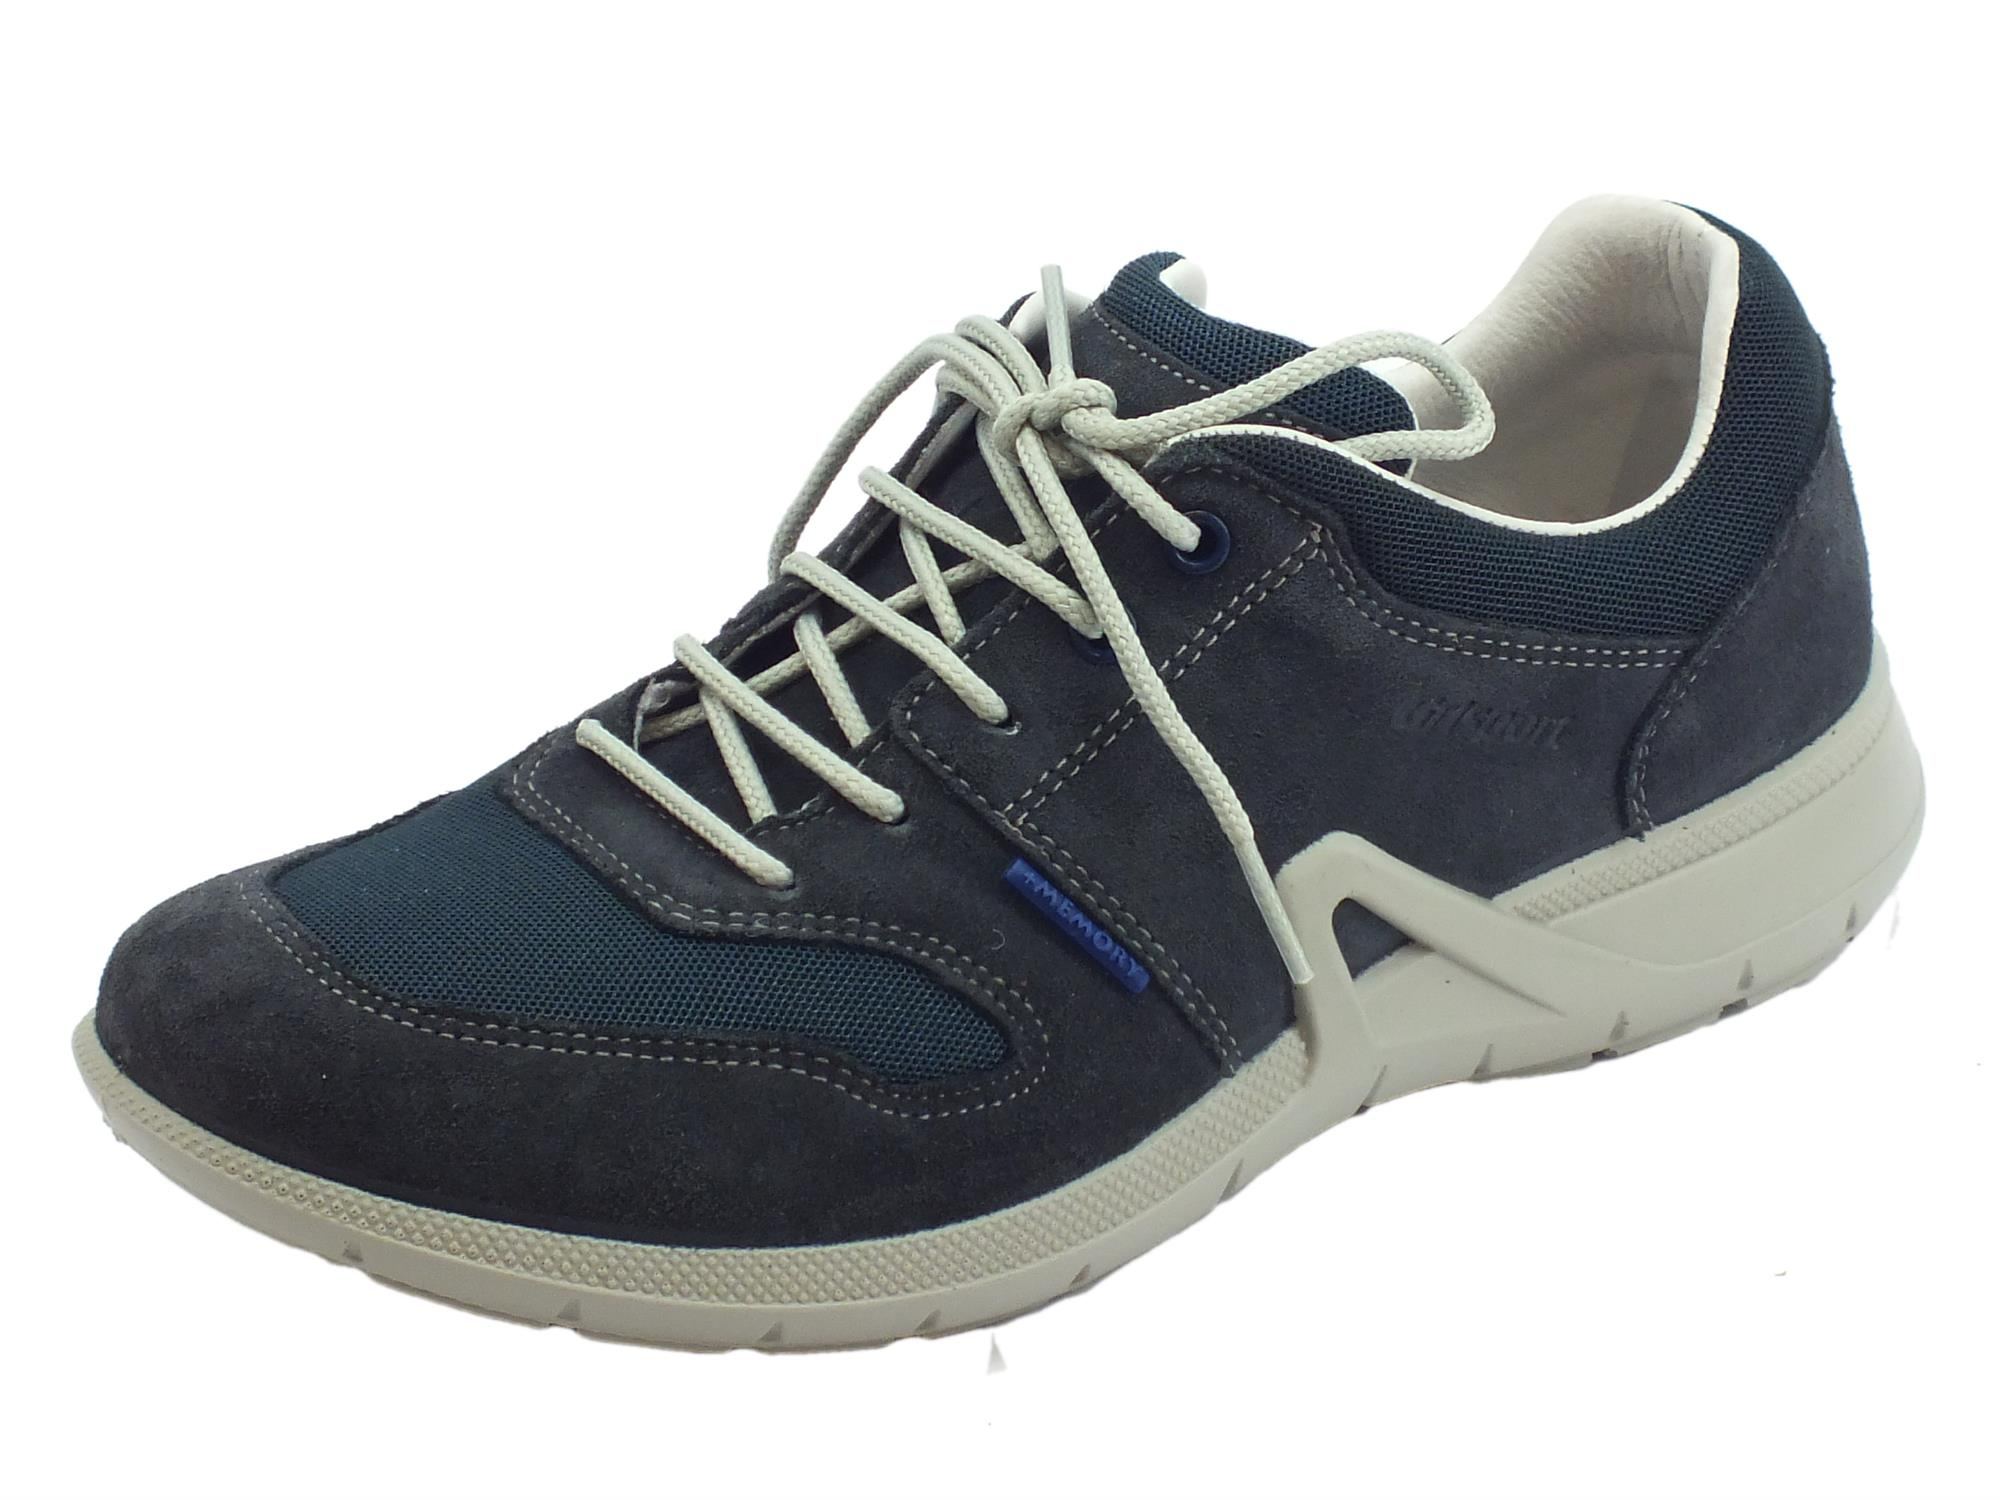 Scarpe Grisport uomo nabuk tessuto blu sottopiede memory - Vitiello ... 423cb995453